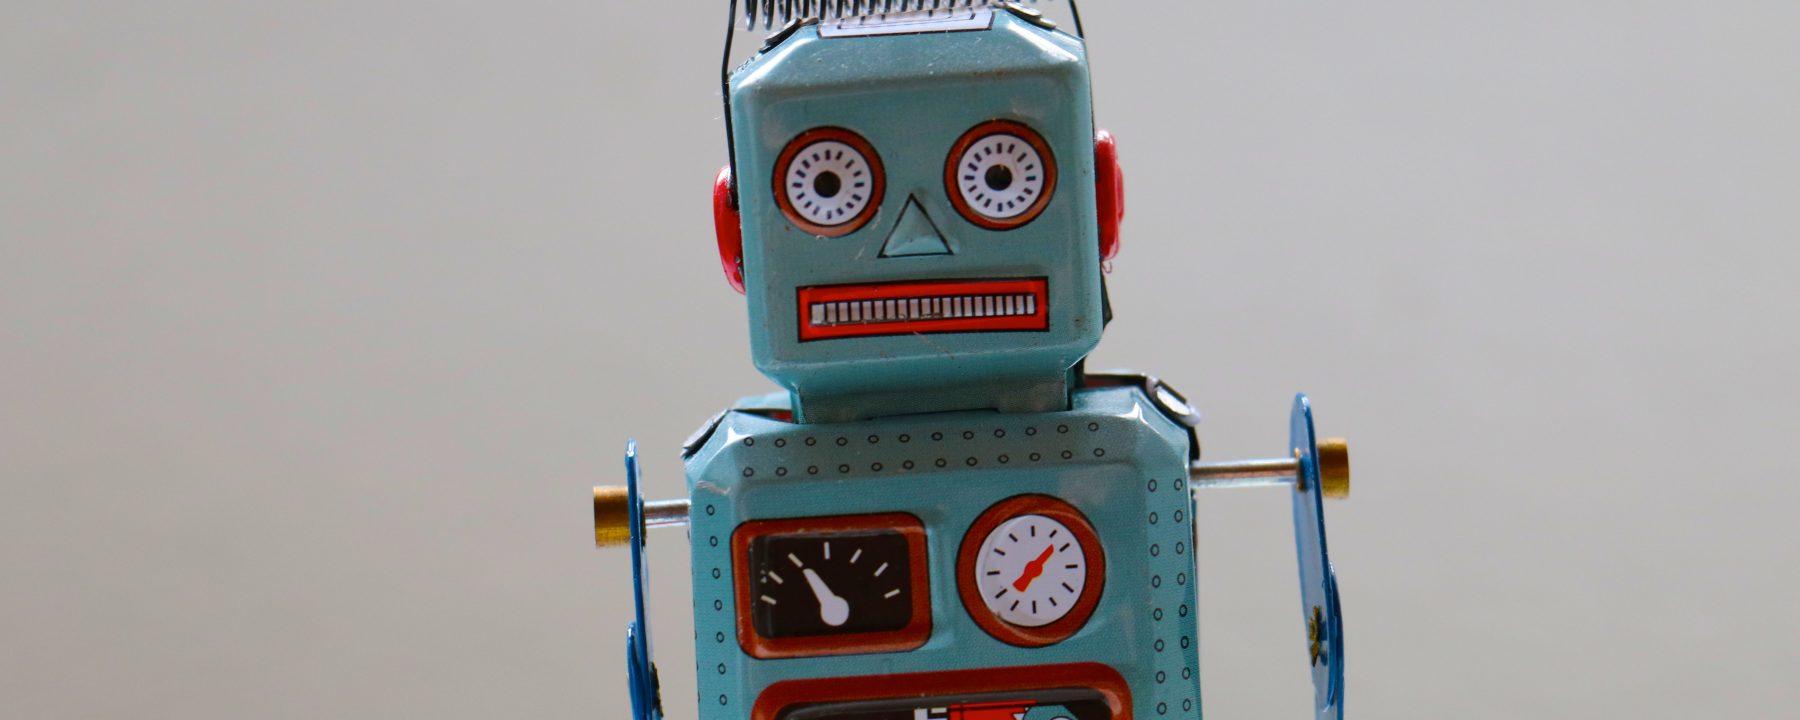 AI Kunsitg intelligens foredrag innovation lab